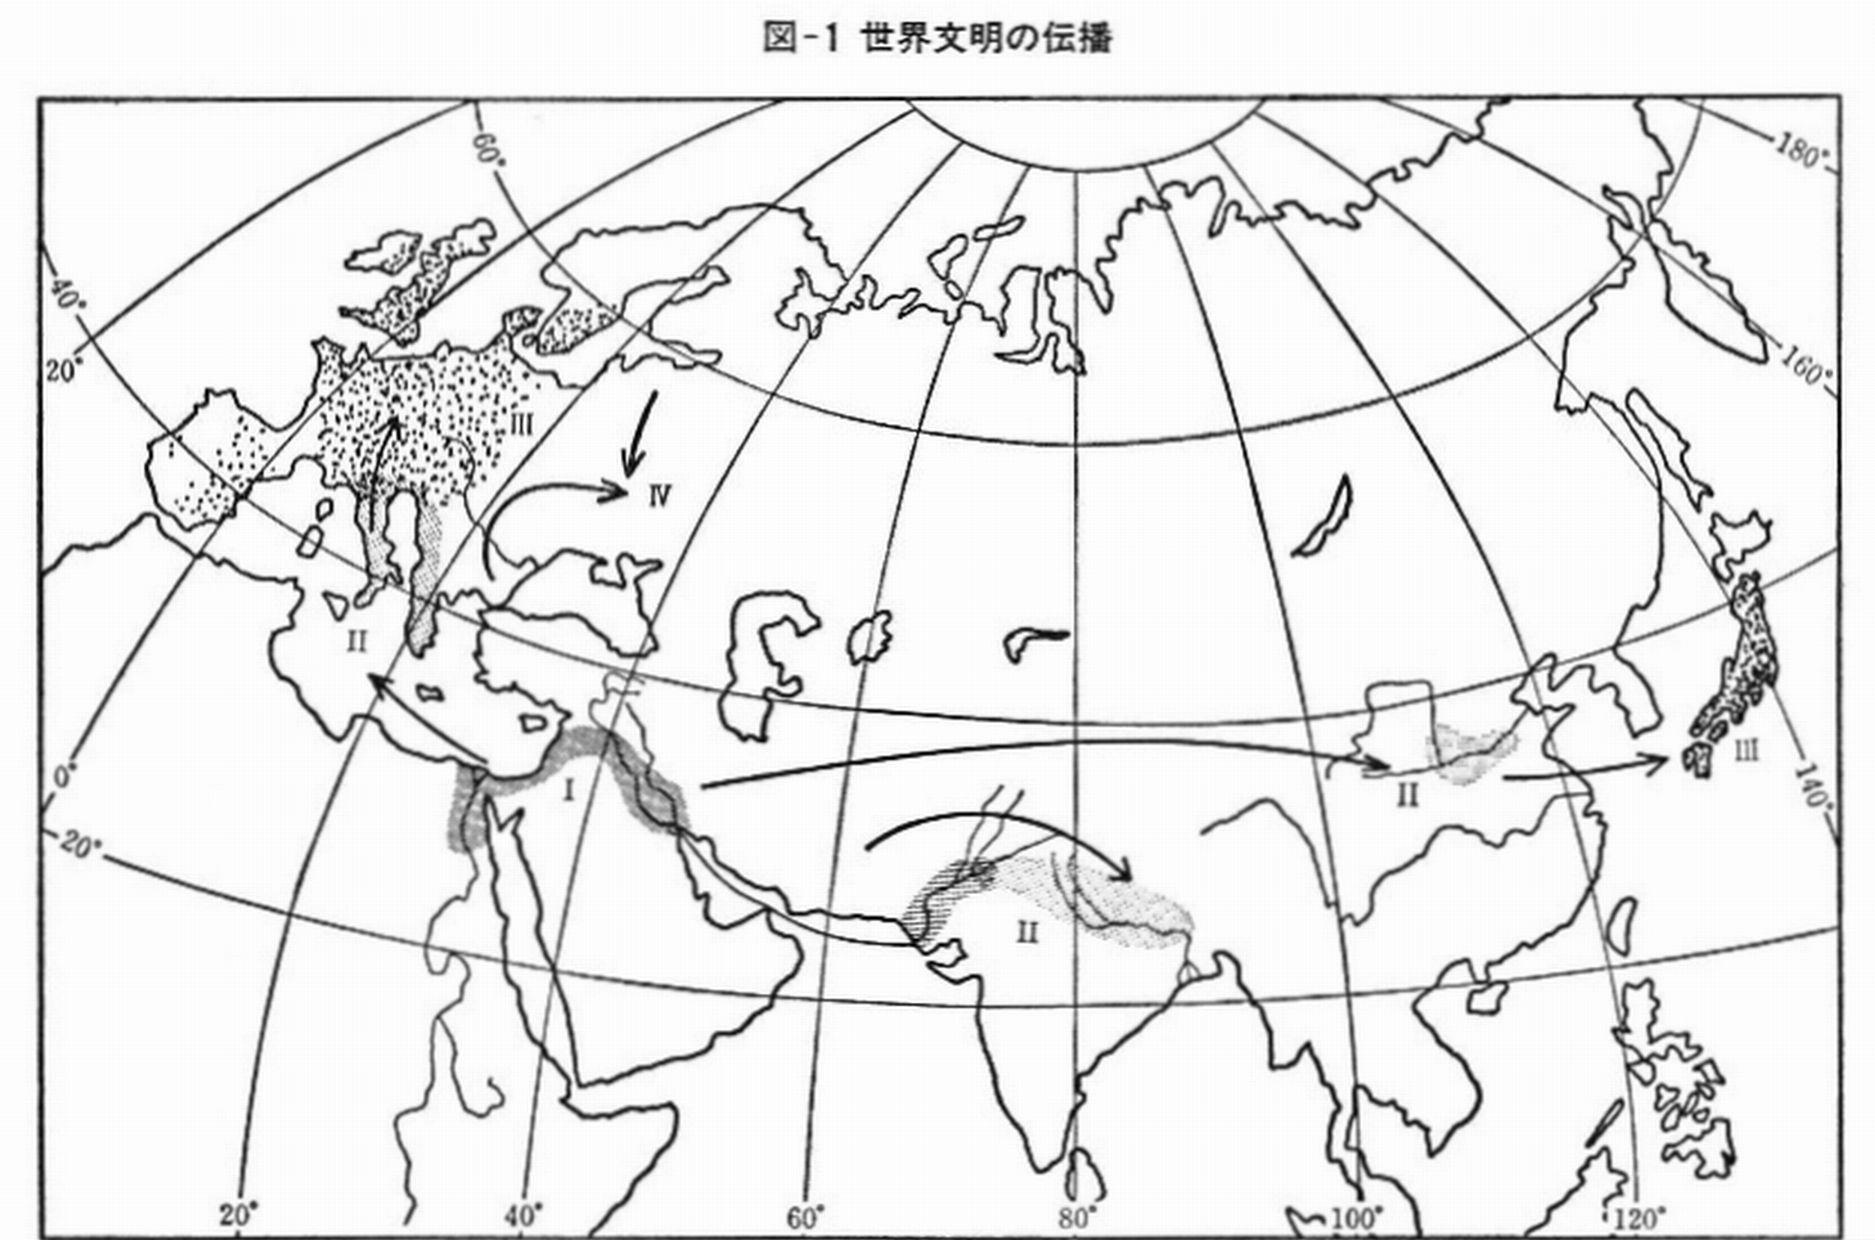 世界文明の伝播図